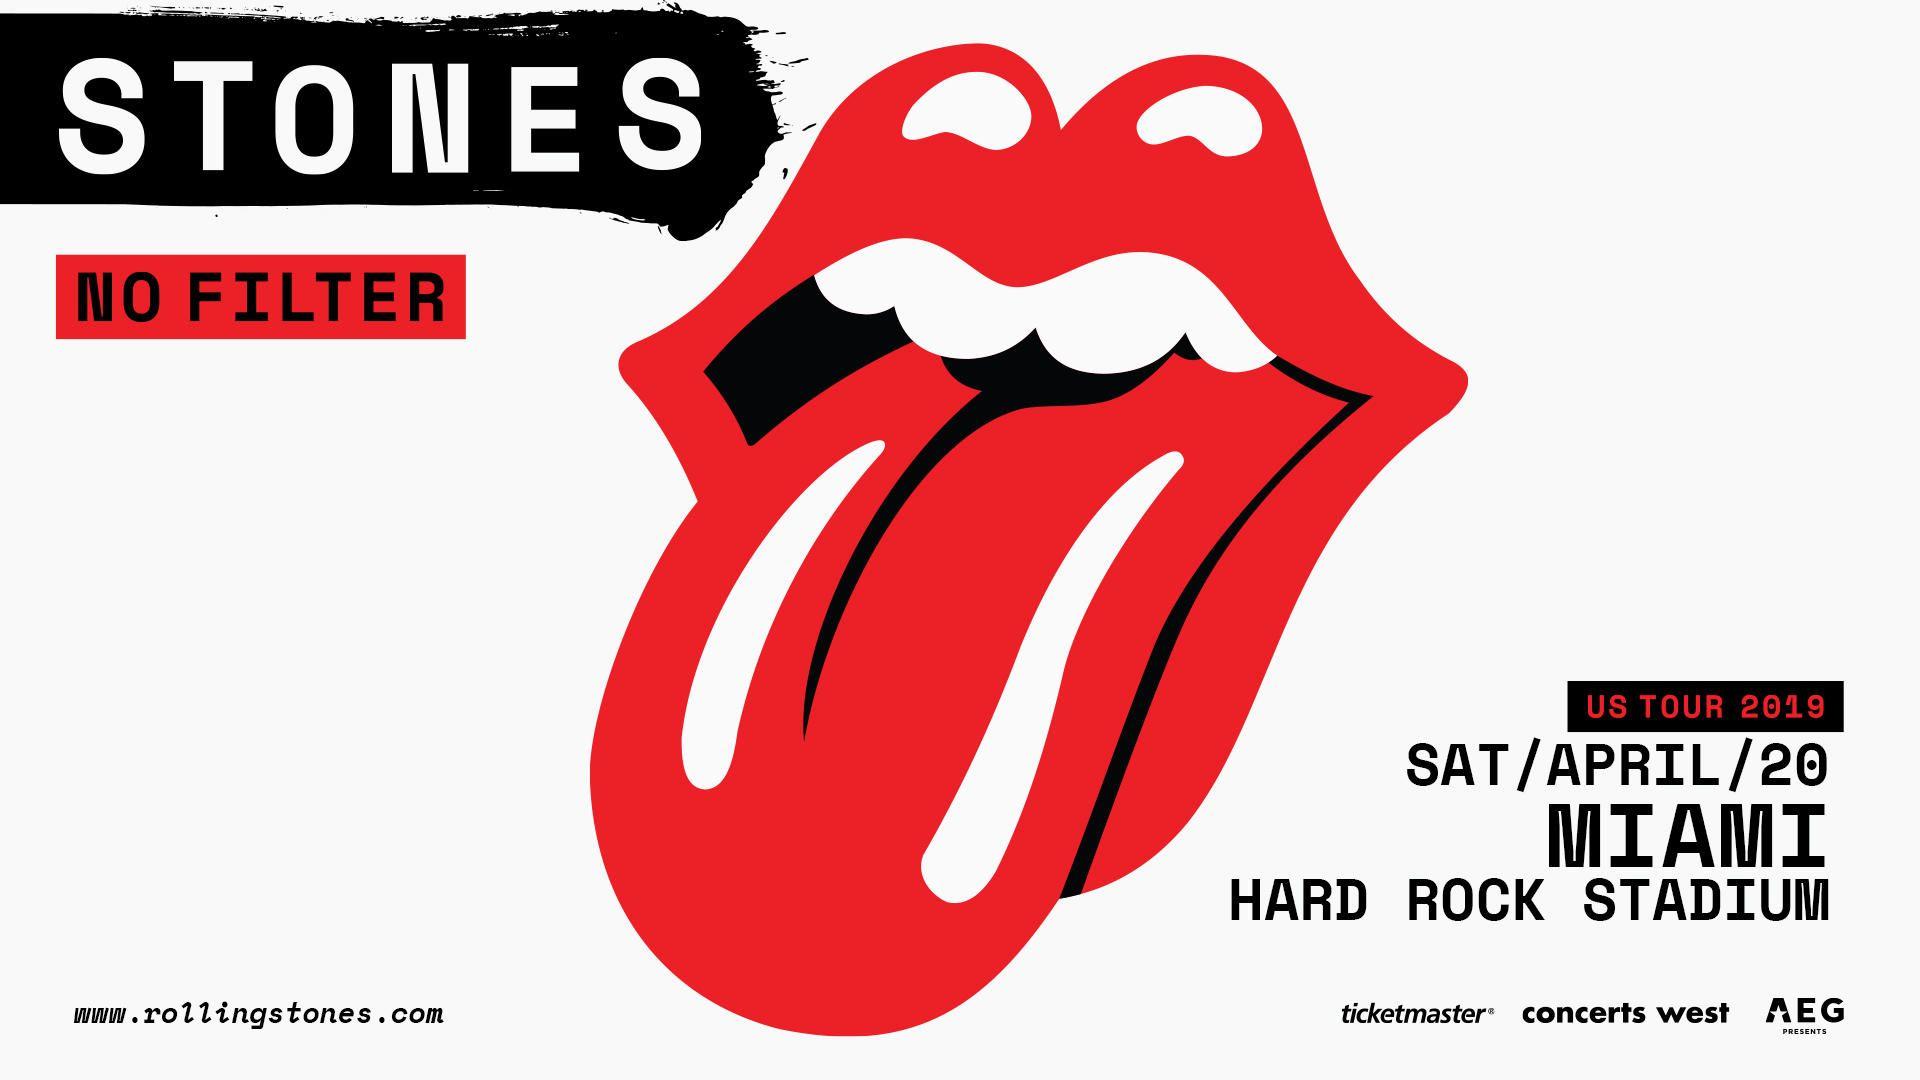 Rolling Stones hd